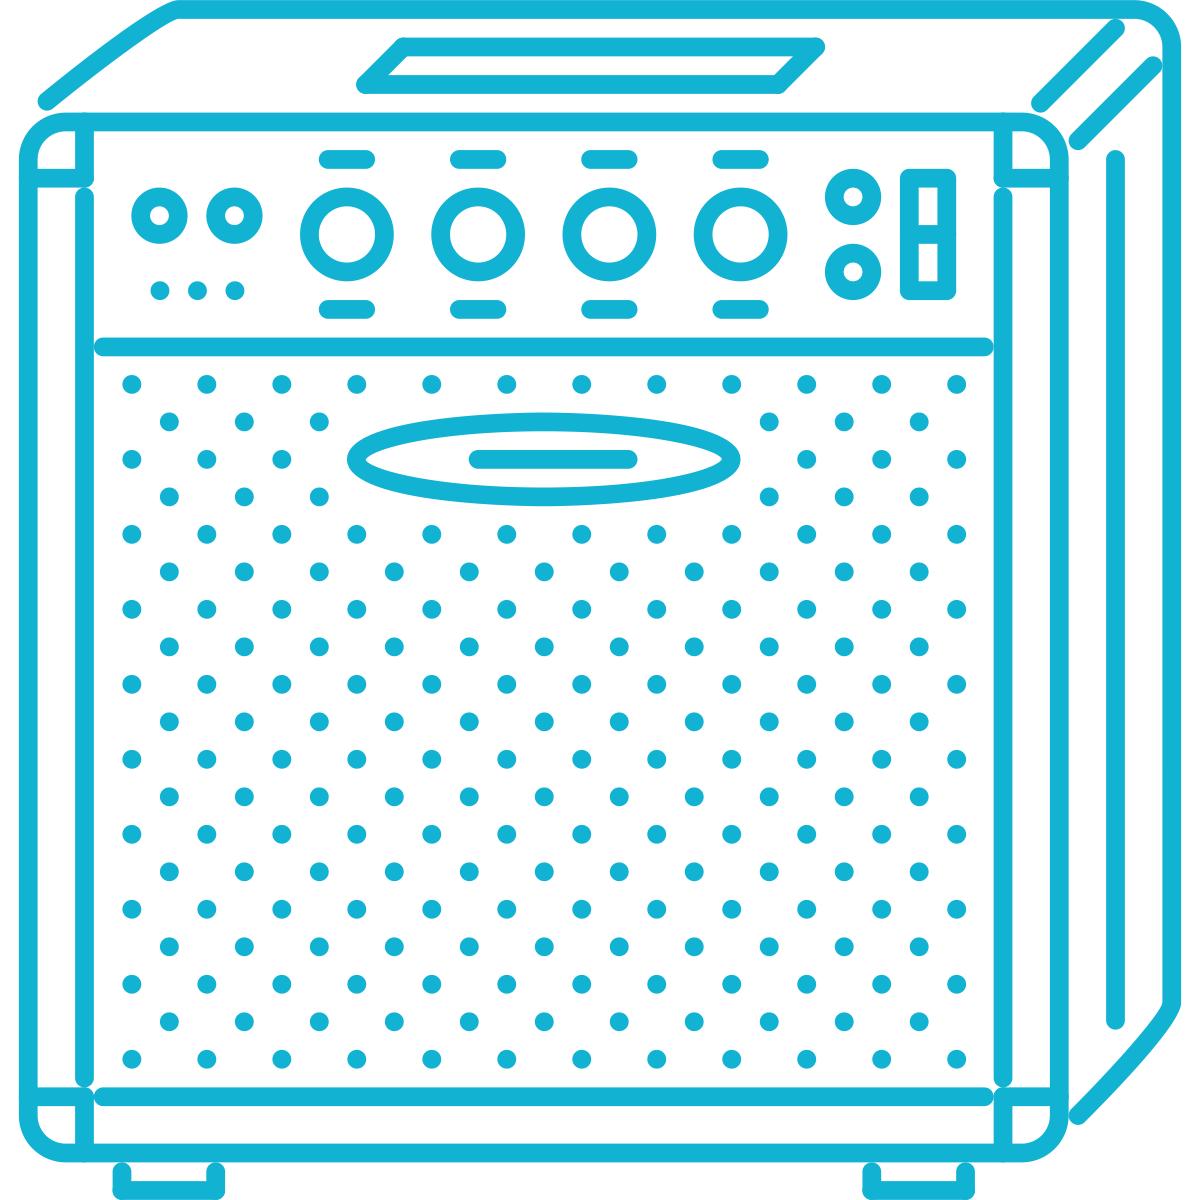 noun_guitar amplifier_1203805_12b2d2.png